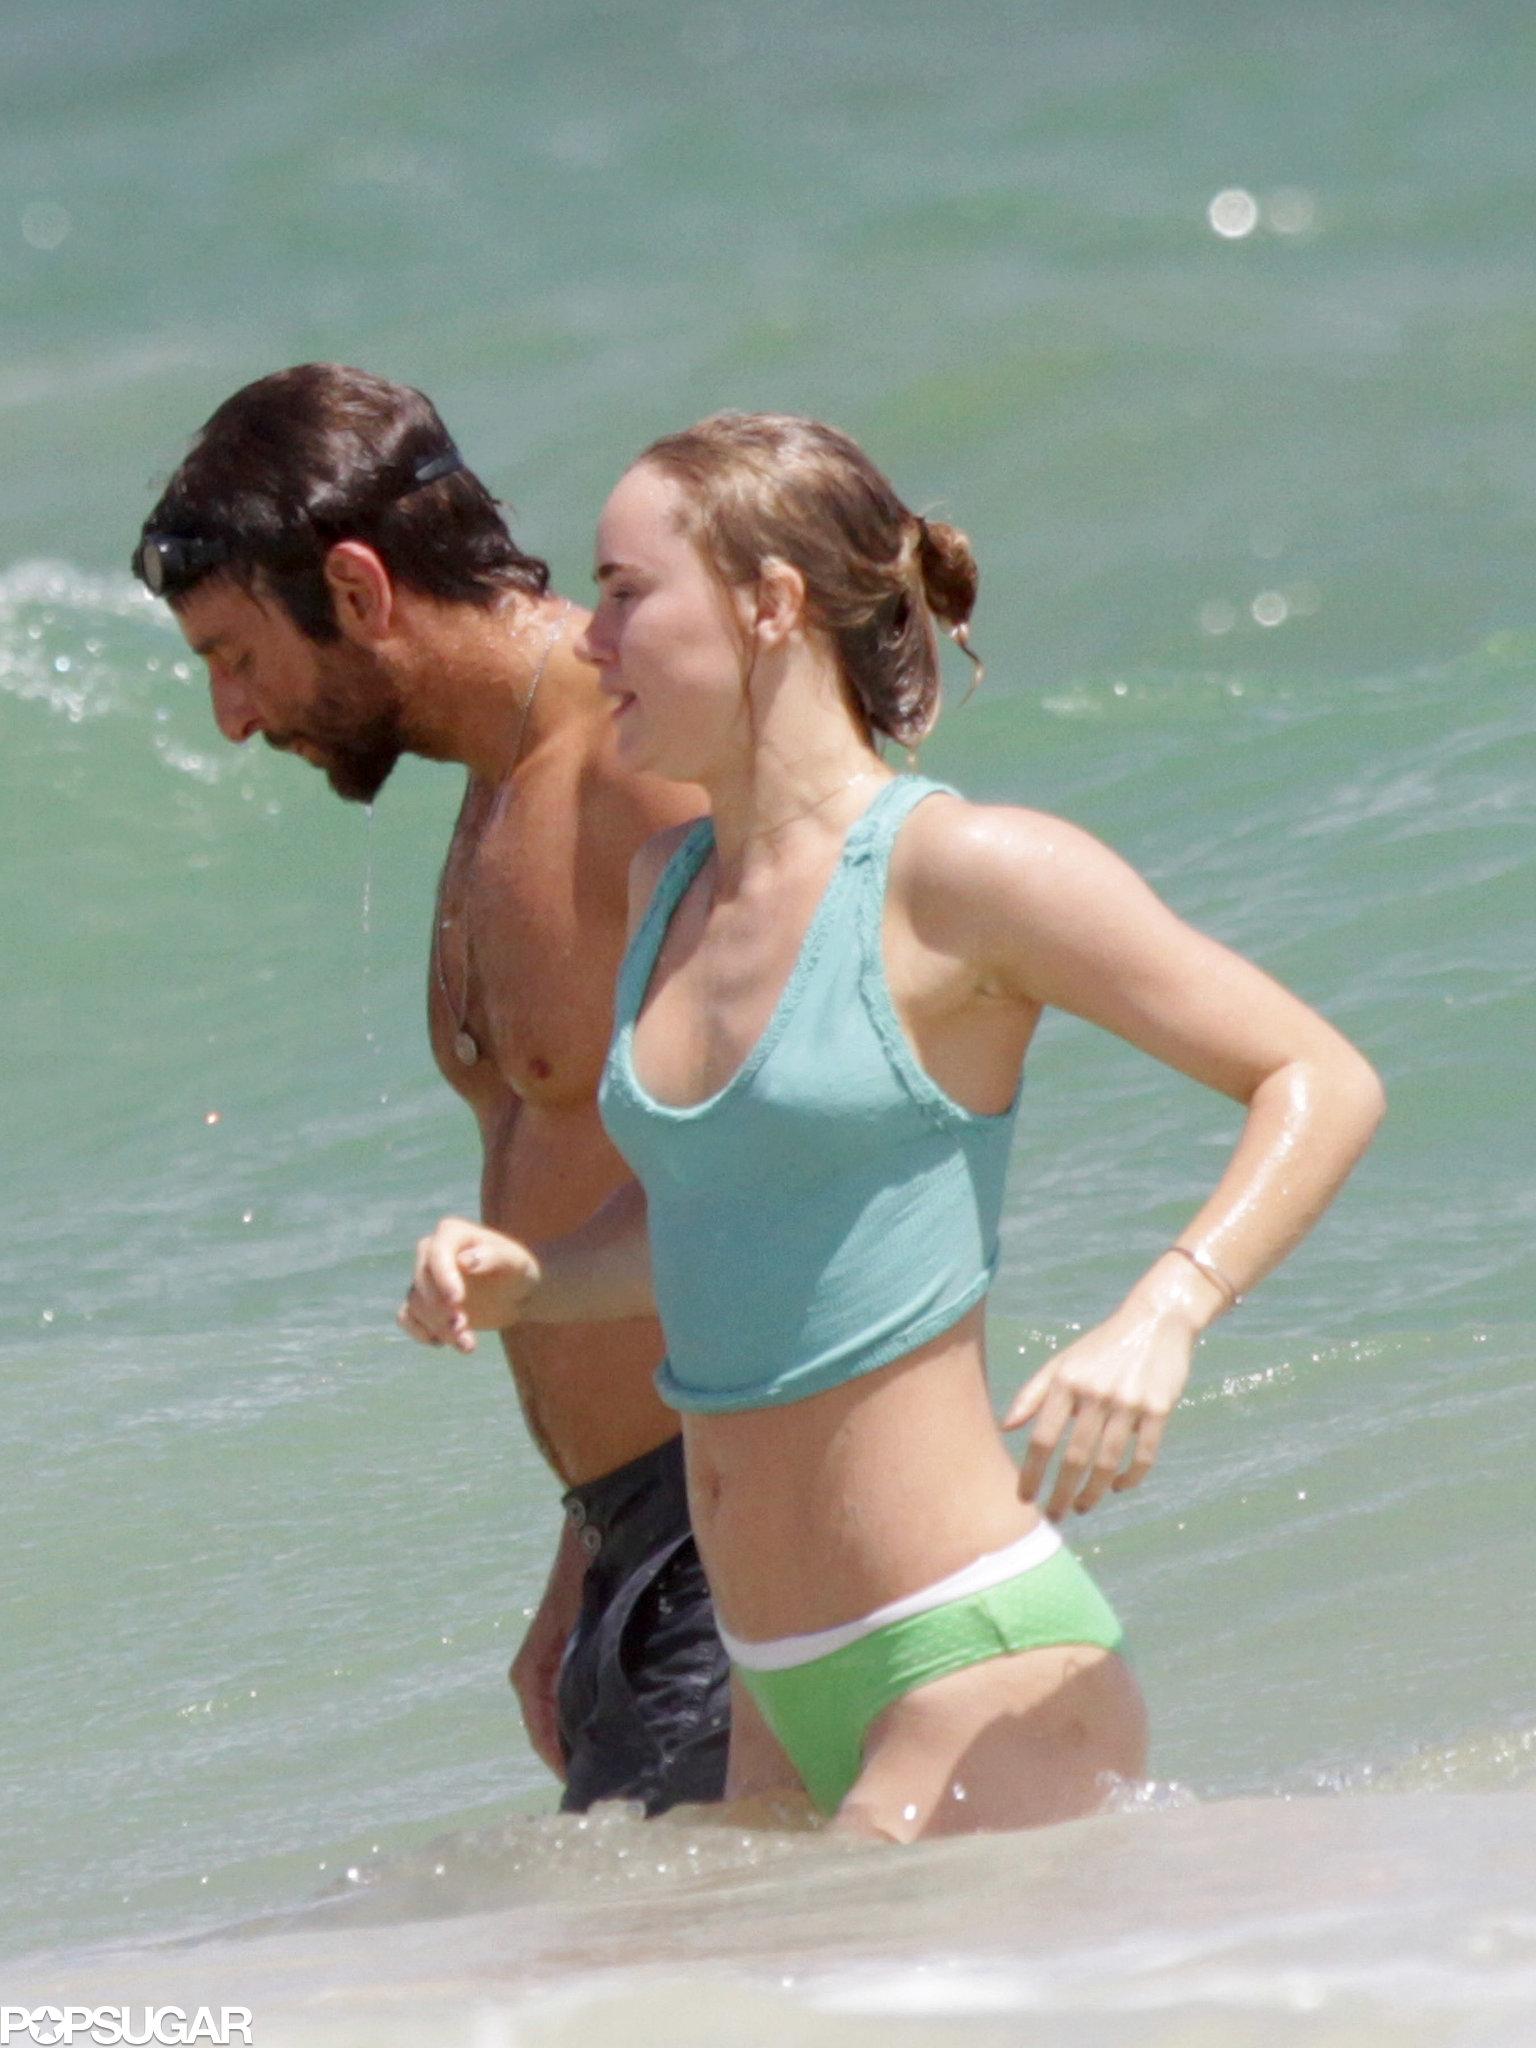 Bradley Cooper and Suki Waterhouse hit the beach during their Hawaii vacation.